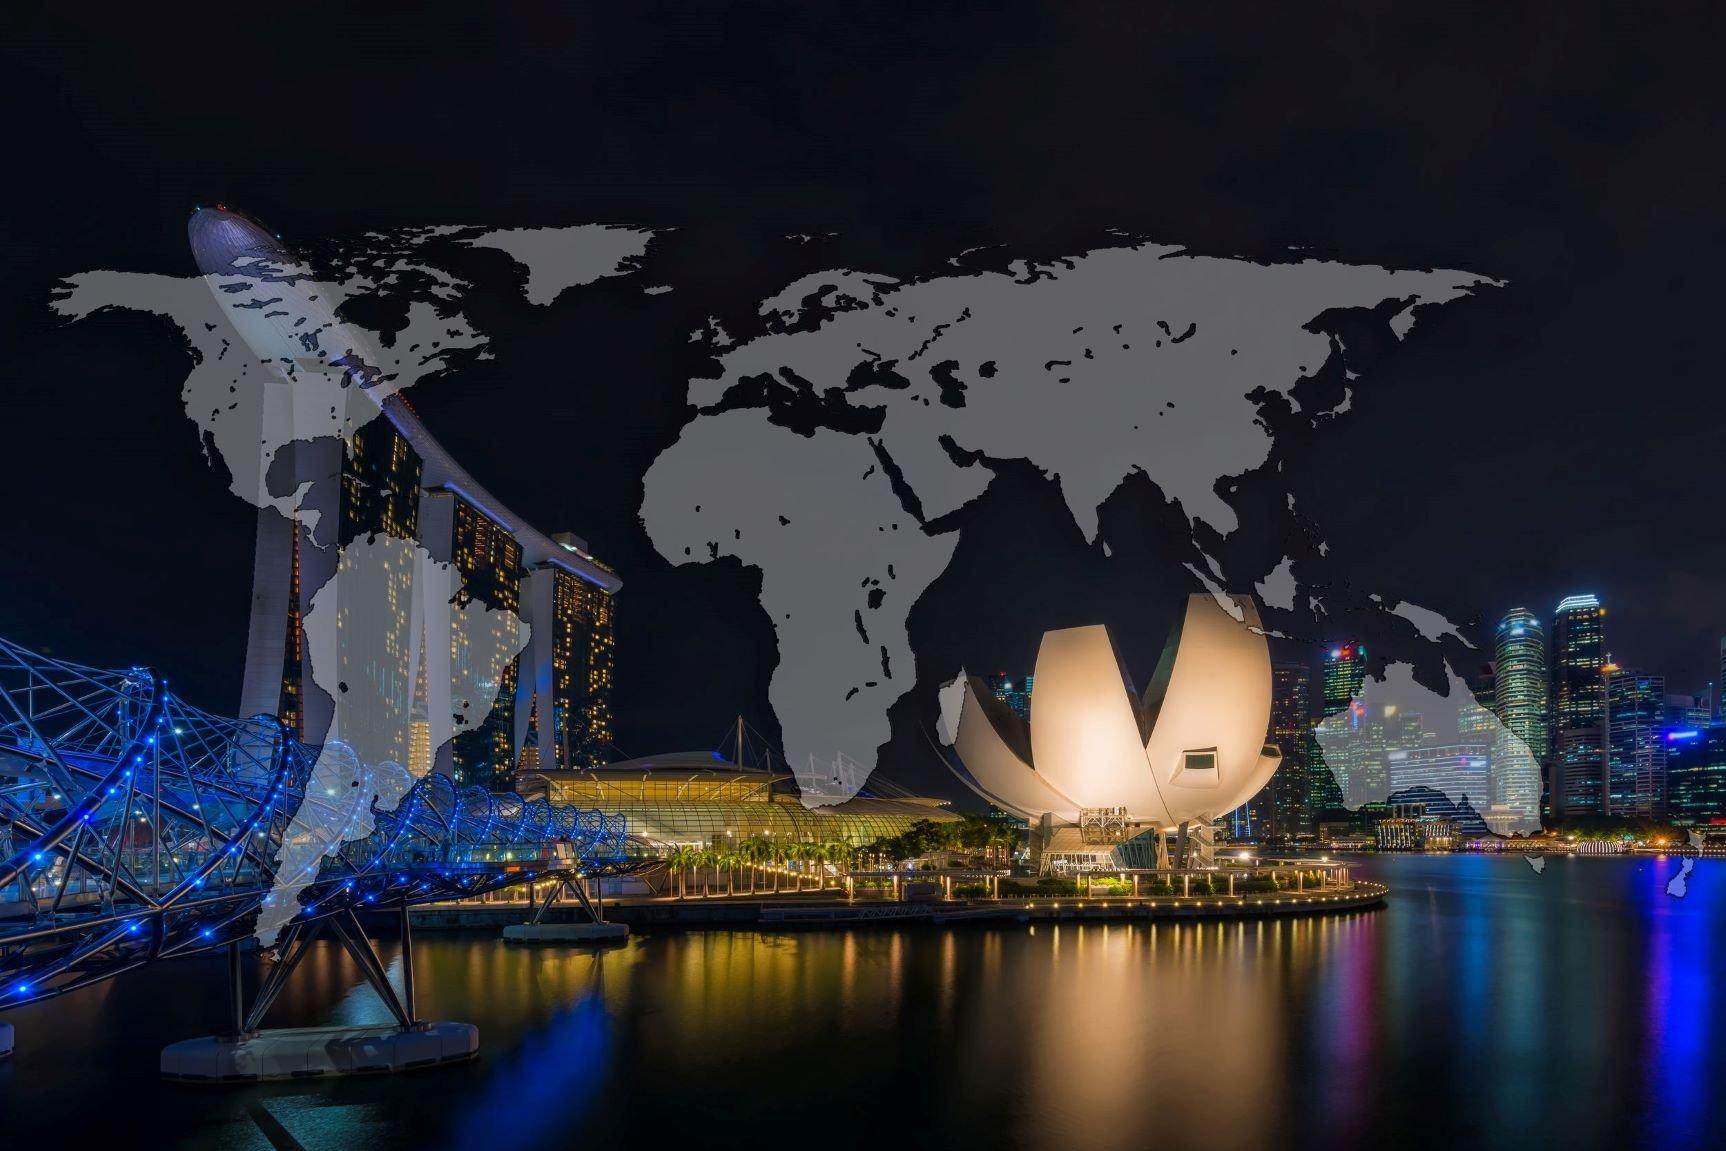 fta adalah, perjanjian dagang, perdagangan internasional, perdagangan Singapura-Indonesia